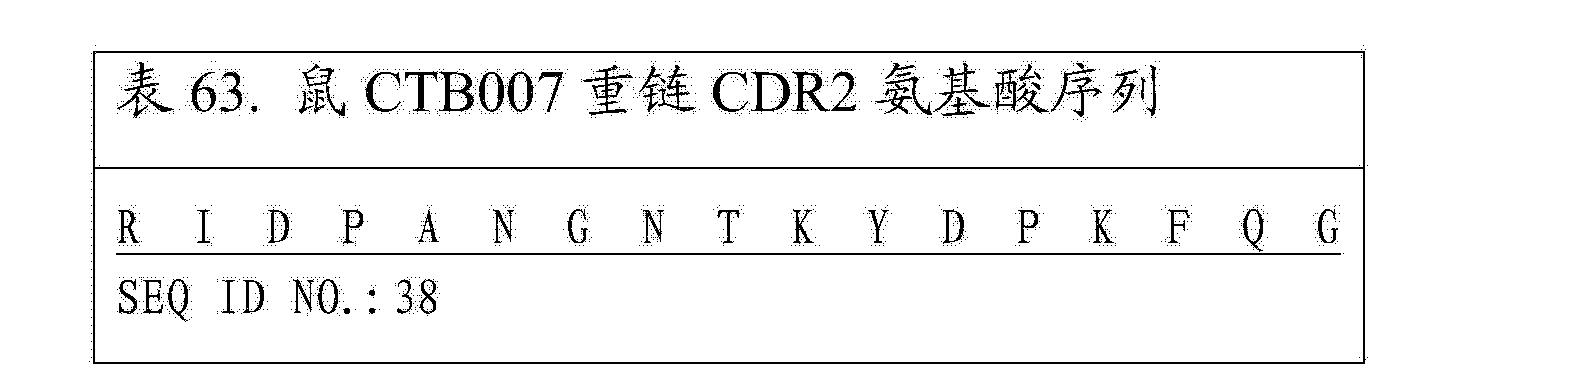 CN104402999A - Trail受体结合剂和其用途- Google Patents